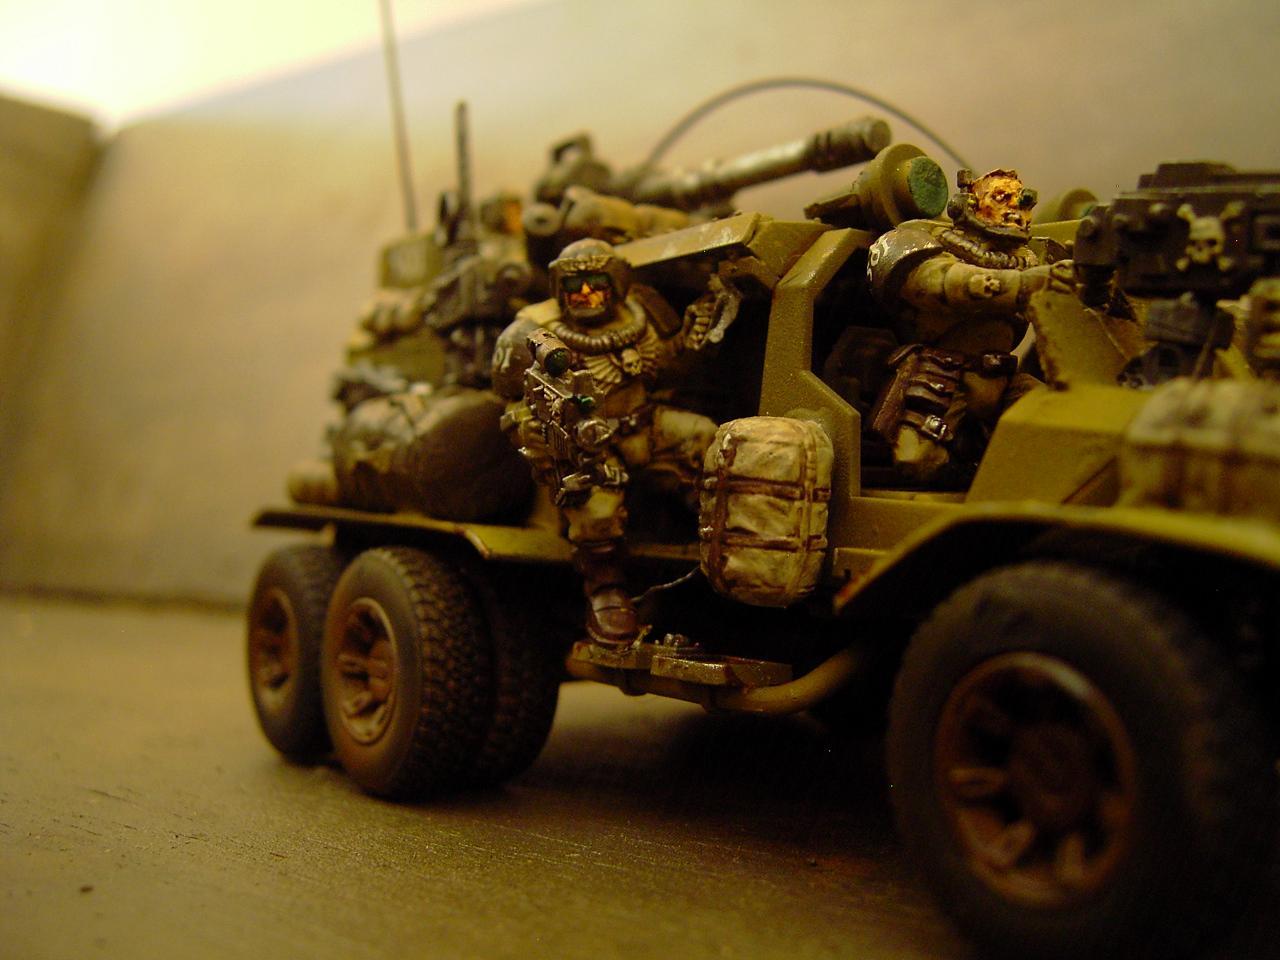 Buggy, Hummer, Imperial Guard, Jeep, Land Runner, Land Speeder, Land Speeder Storm